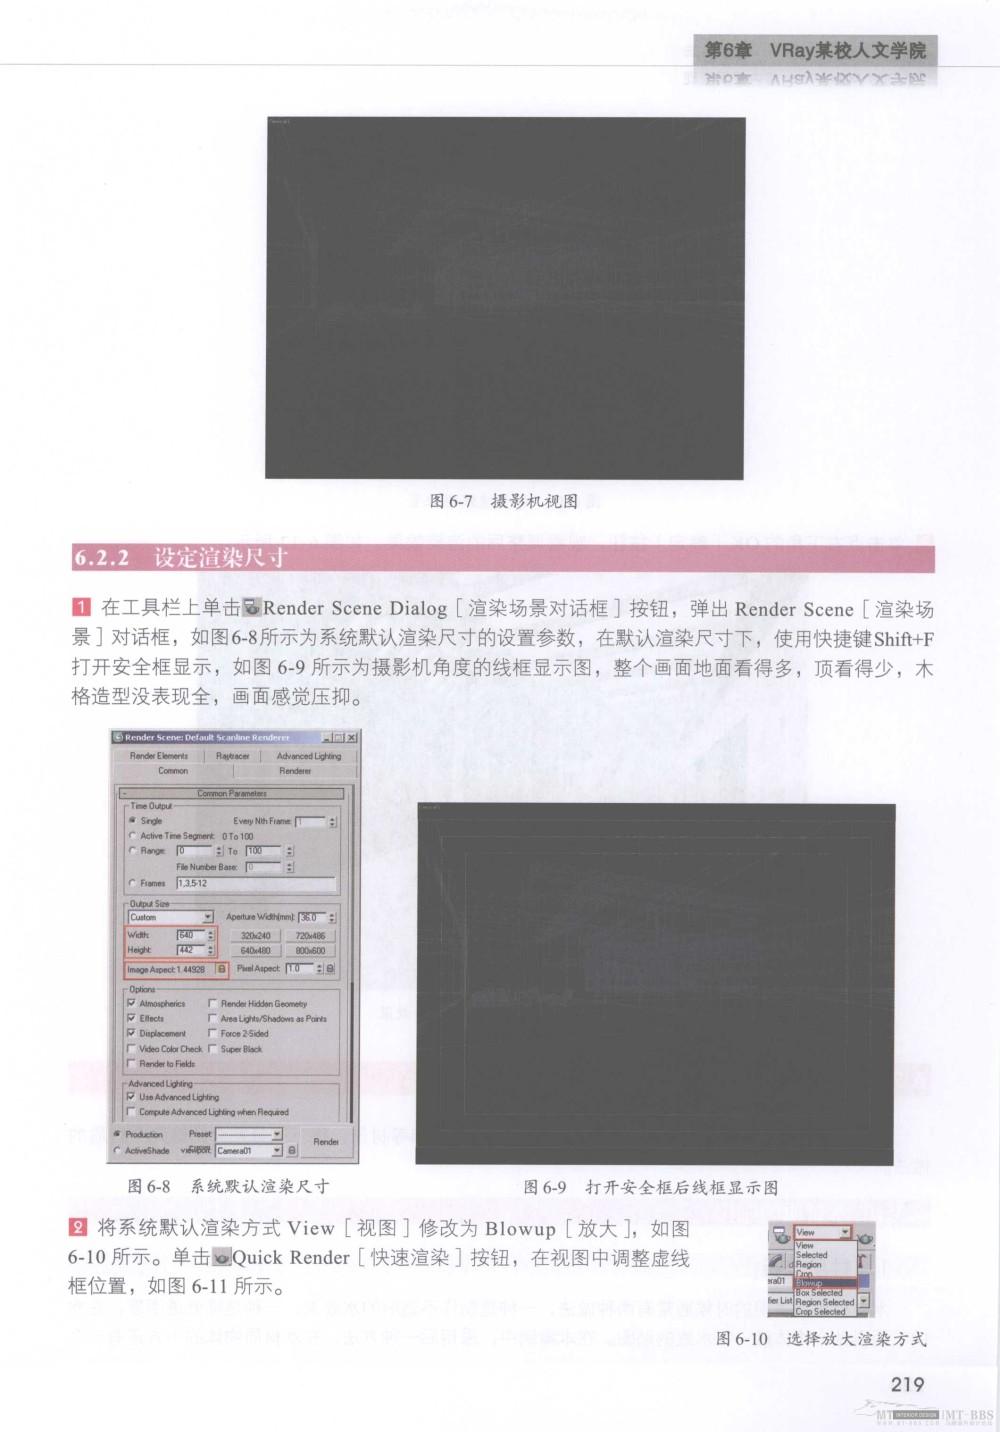 水晶石技法-3ds_Max&VRay室内空间表现_水晶石技法-3ds_Max&VRay室内空间表现_页面_225.jpg